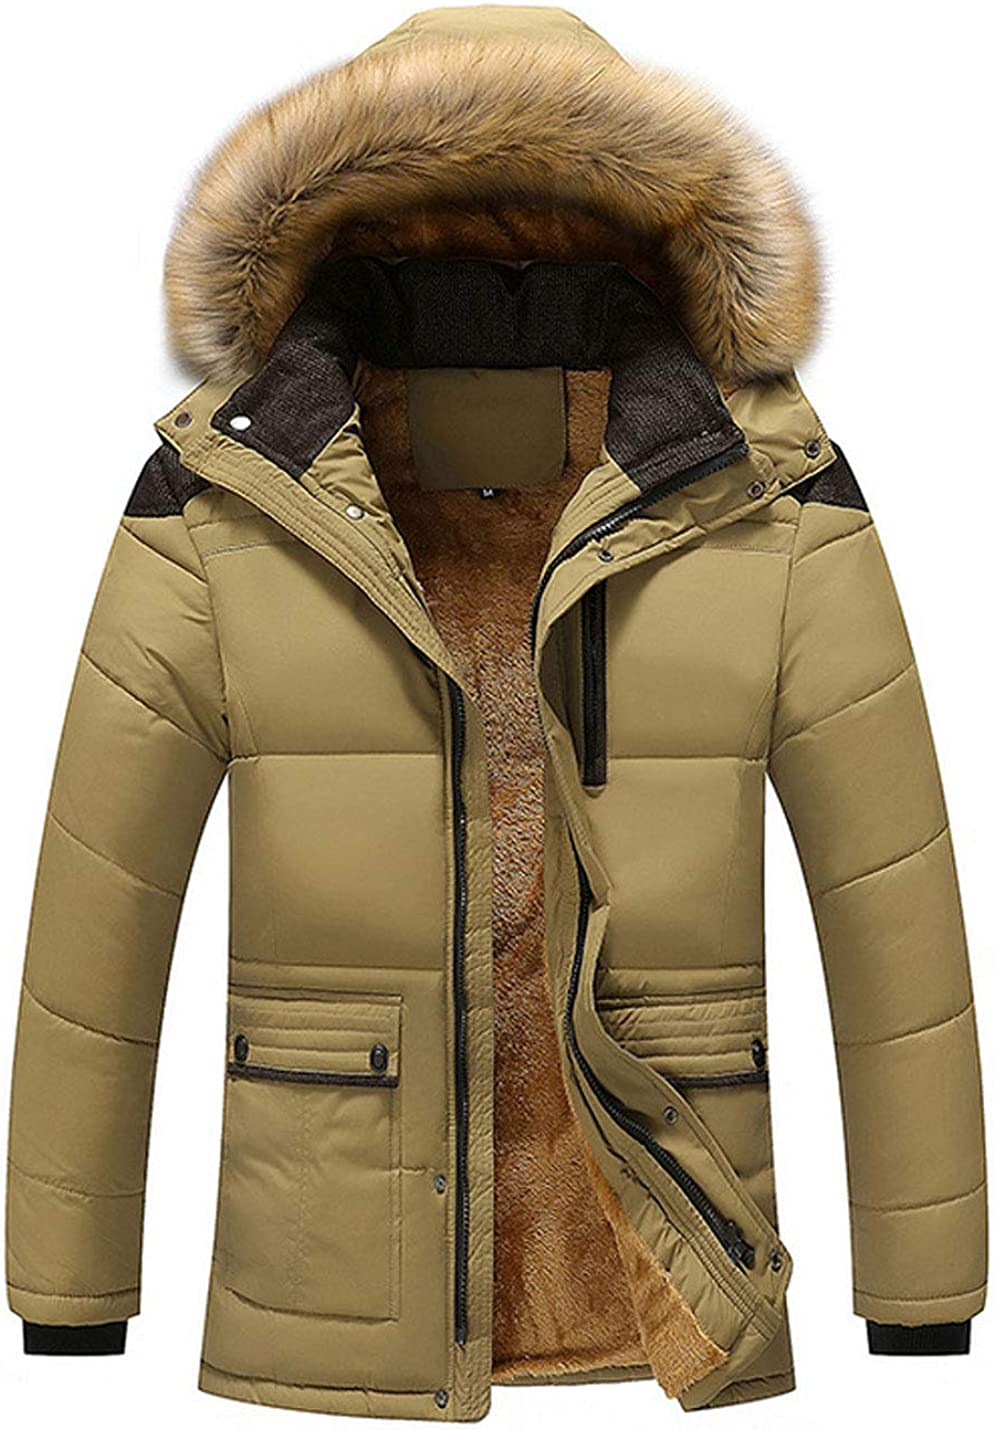 Bankeng Men's Winter Detachable Hooded Frost-Fighter Sherpa Lining Parka Jacket